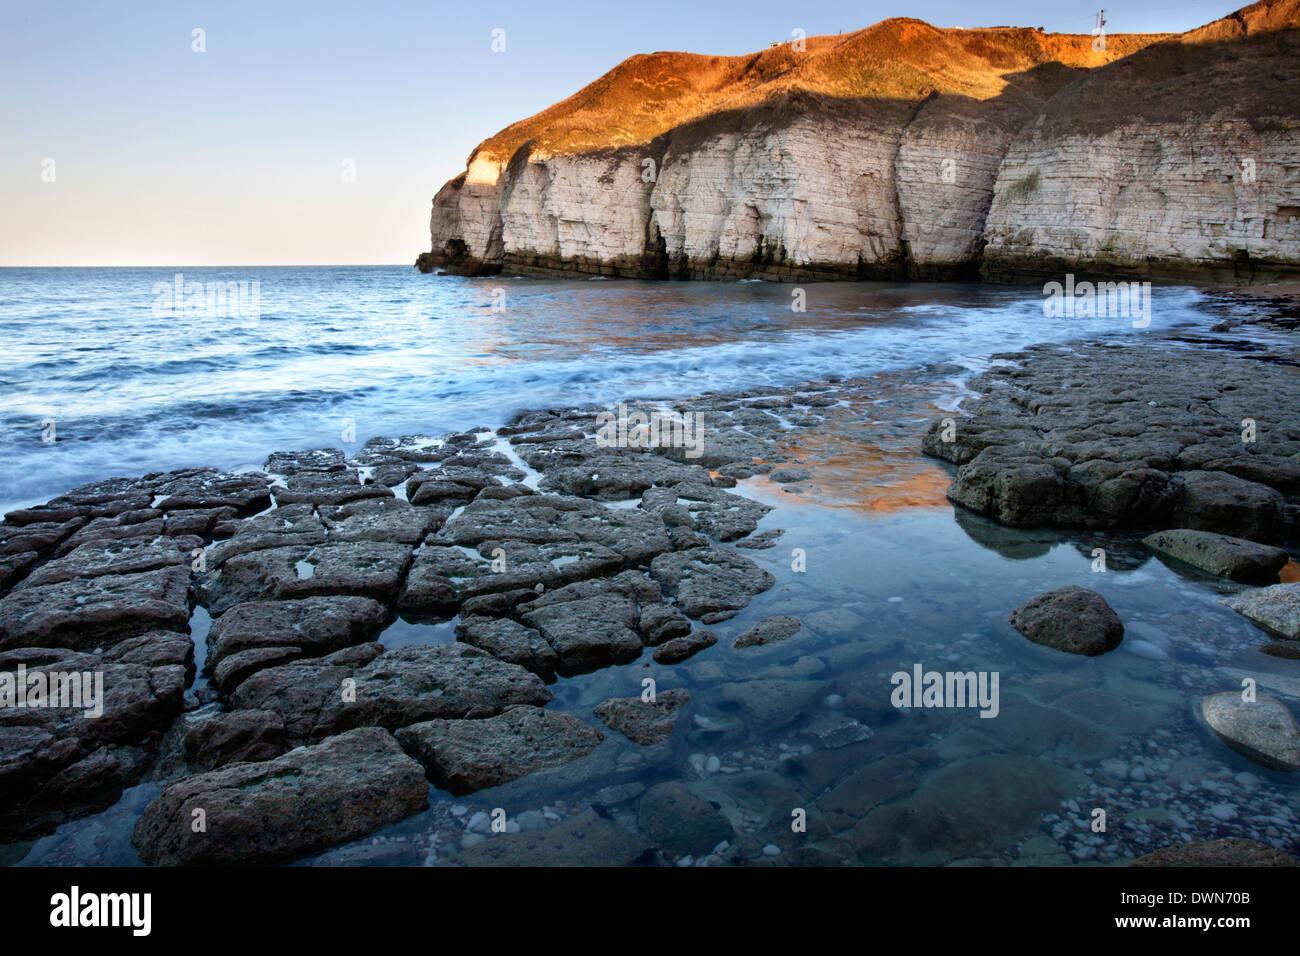 Thornwick Bay at sunset, Flamborough Head, East Riding of Yorkshire, England, United Kingdom, Europe Stock Photo